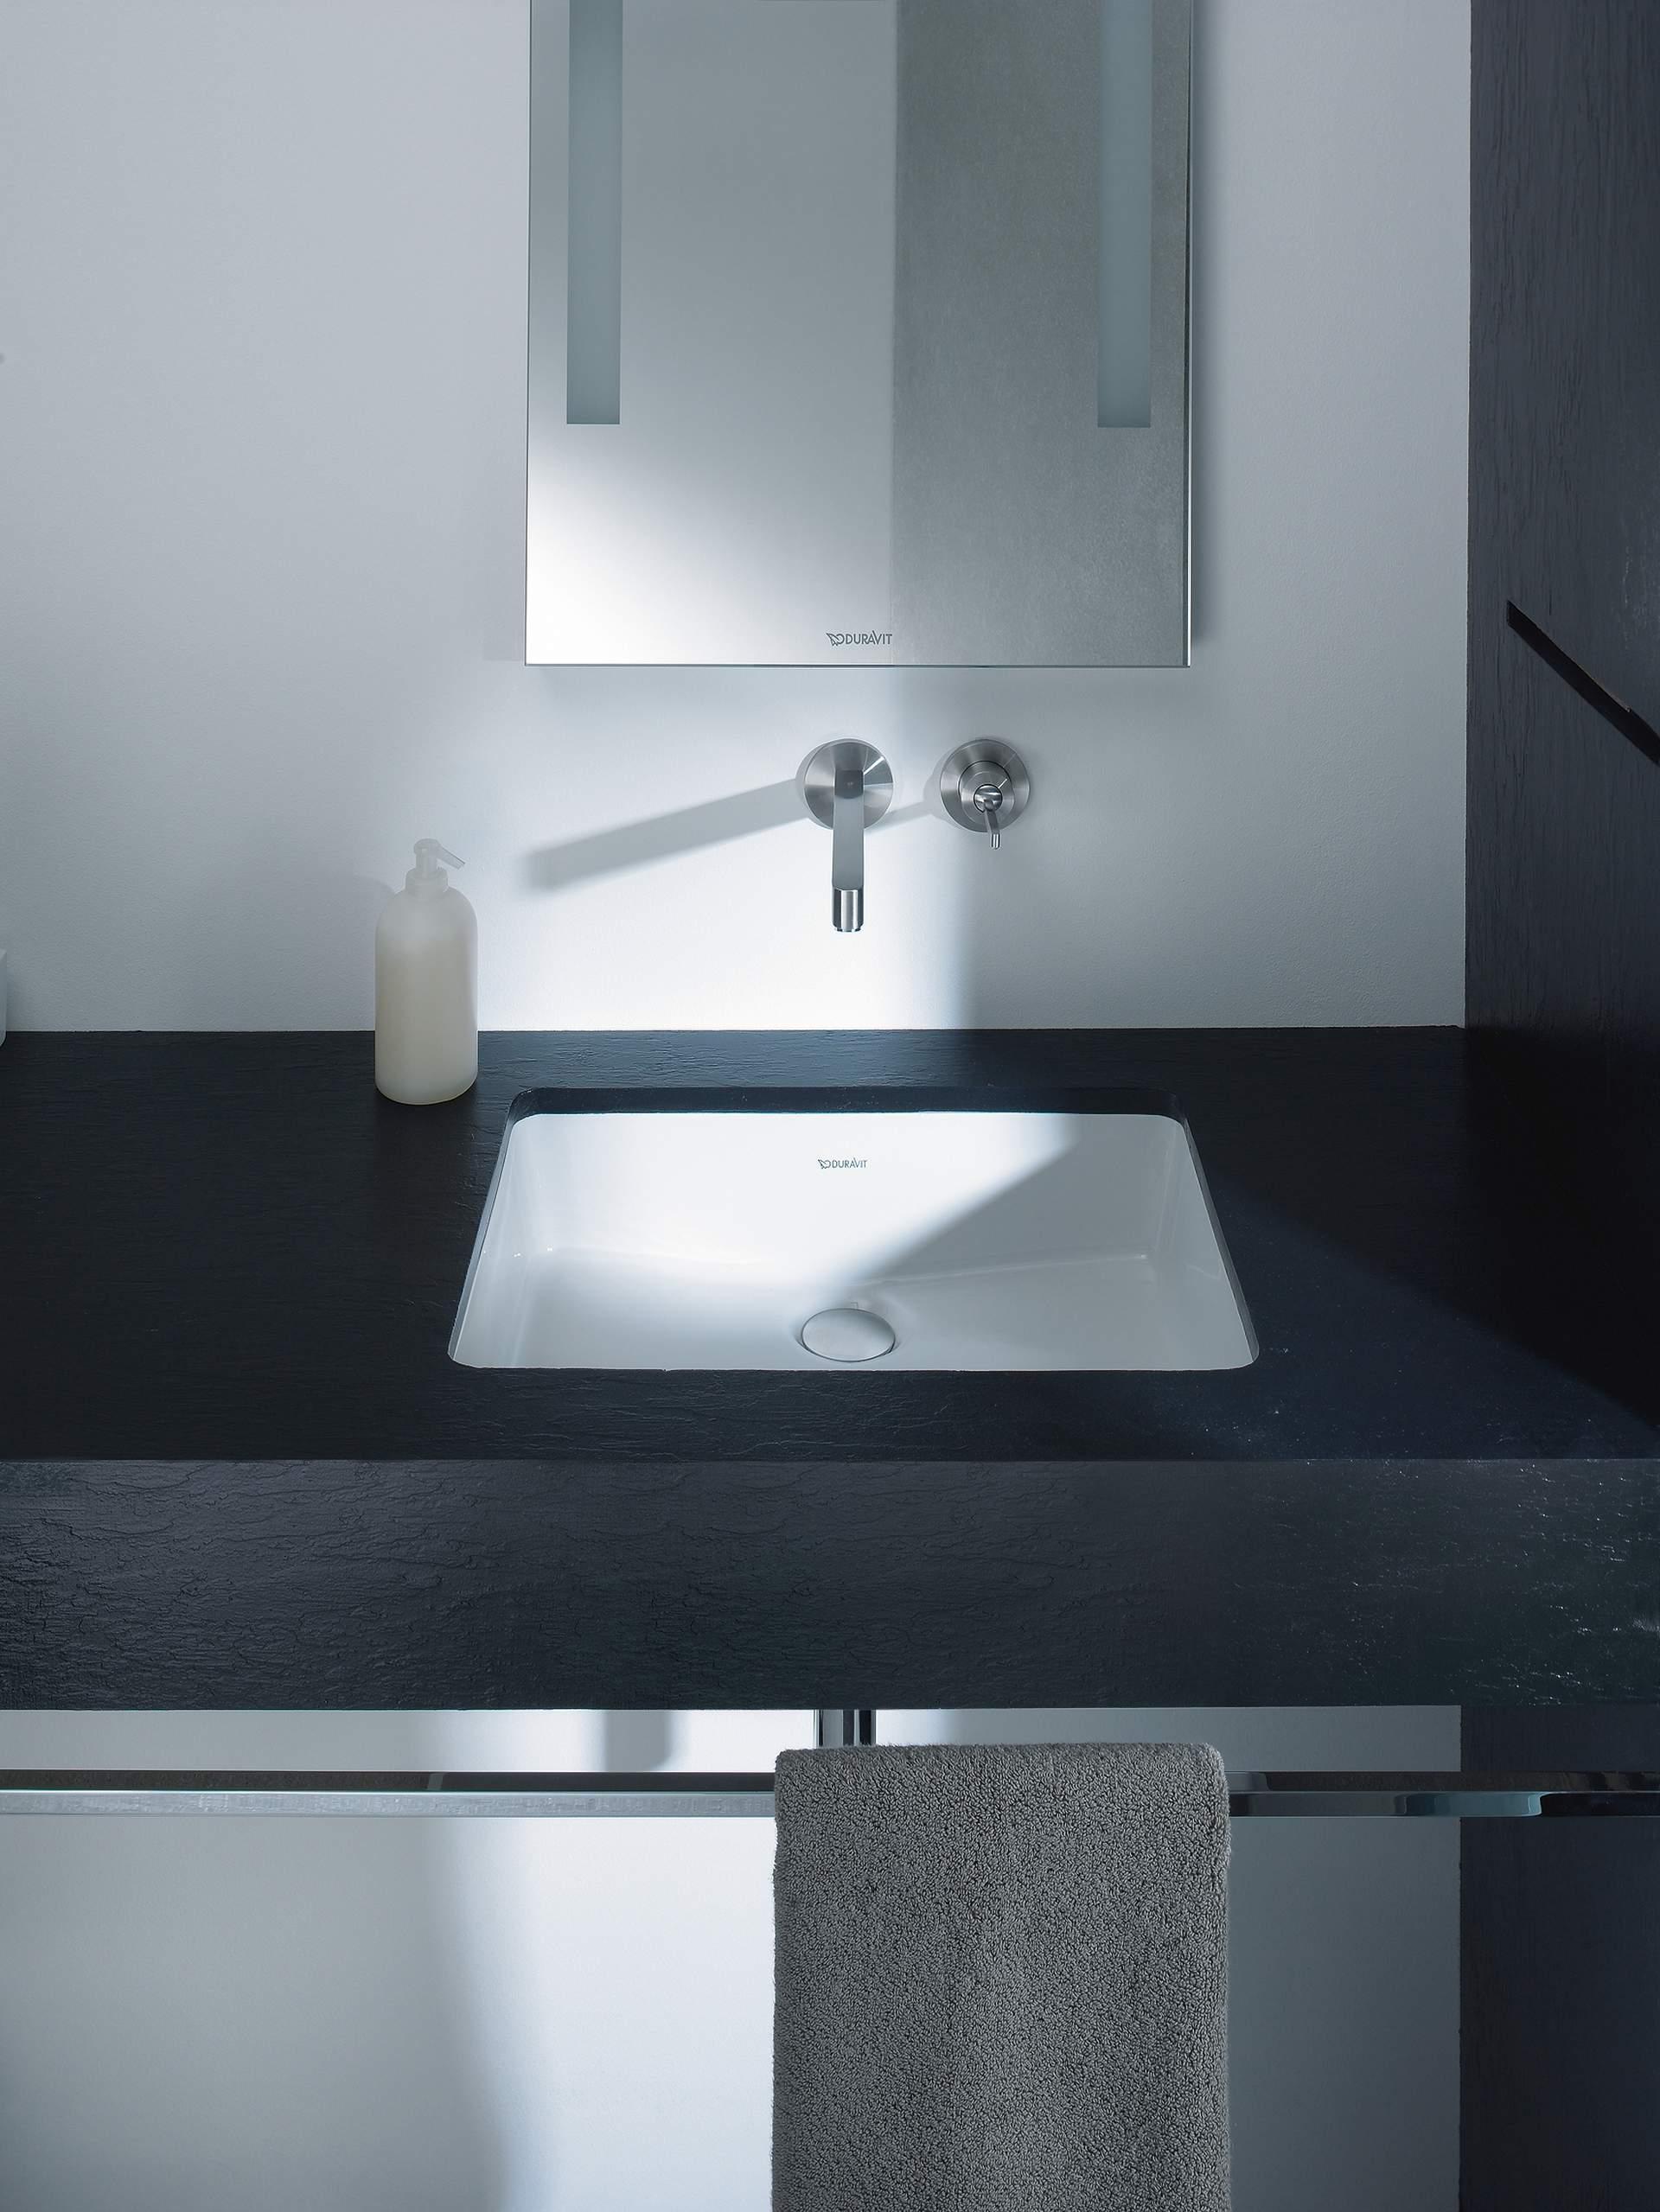 Duravit Vero Washbasins Toilets Bathtubs Amp More Duravit